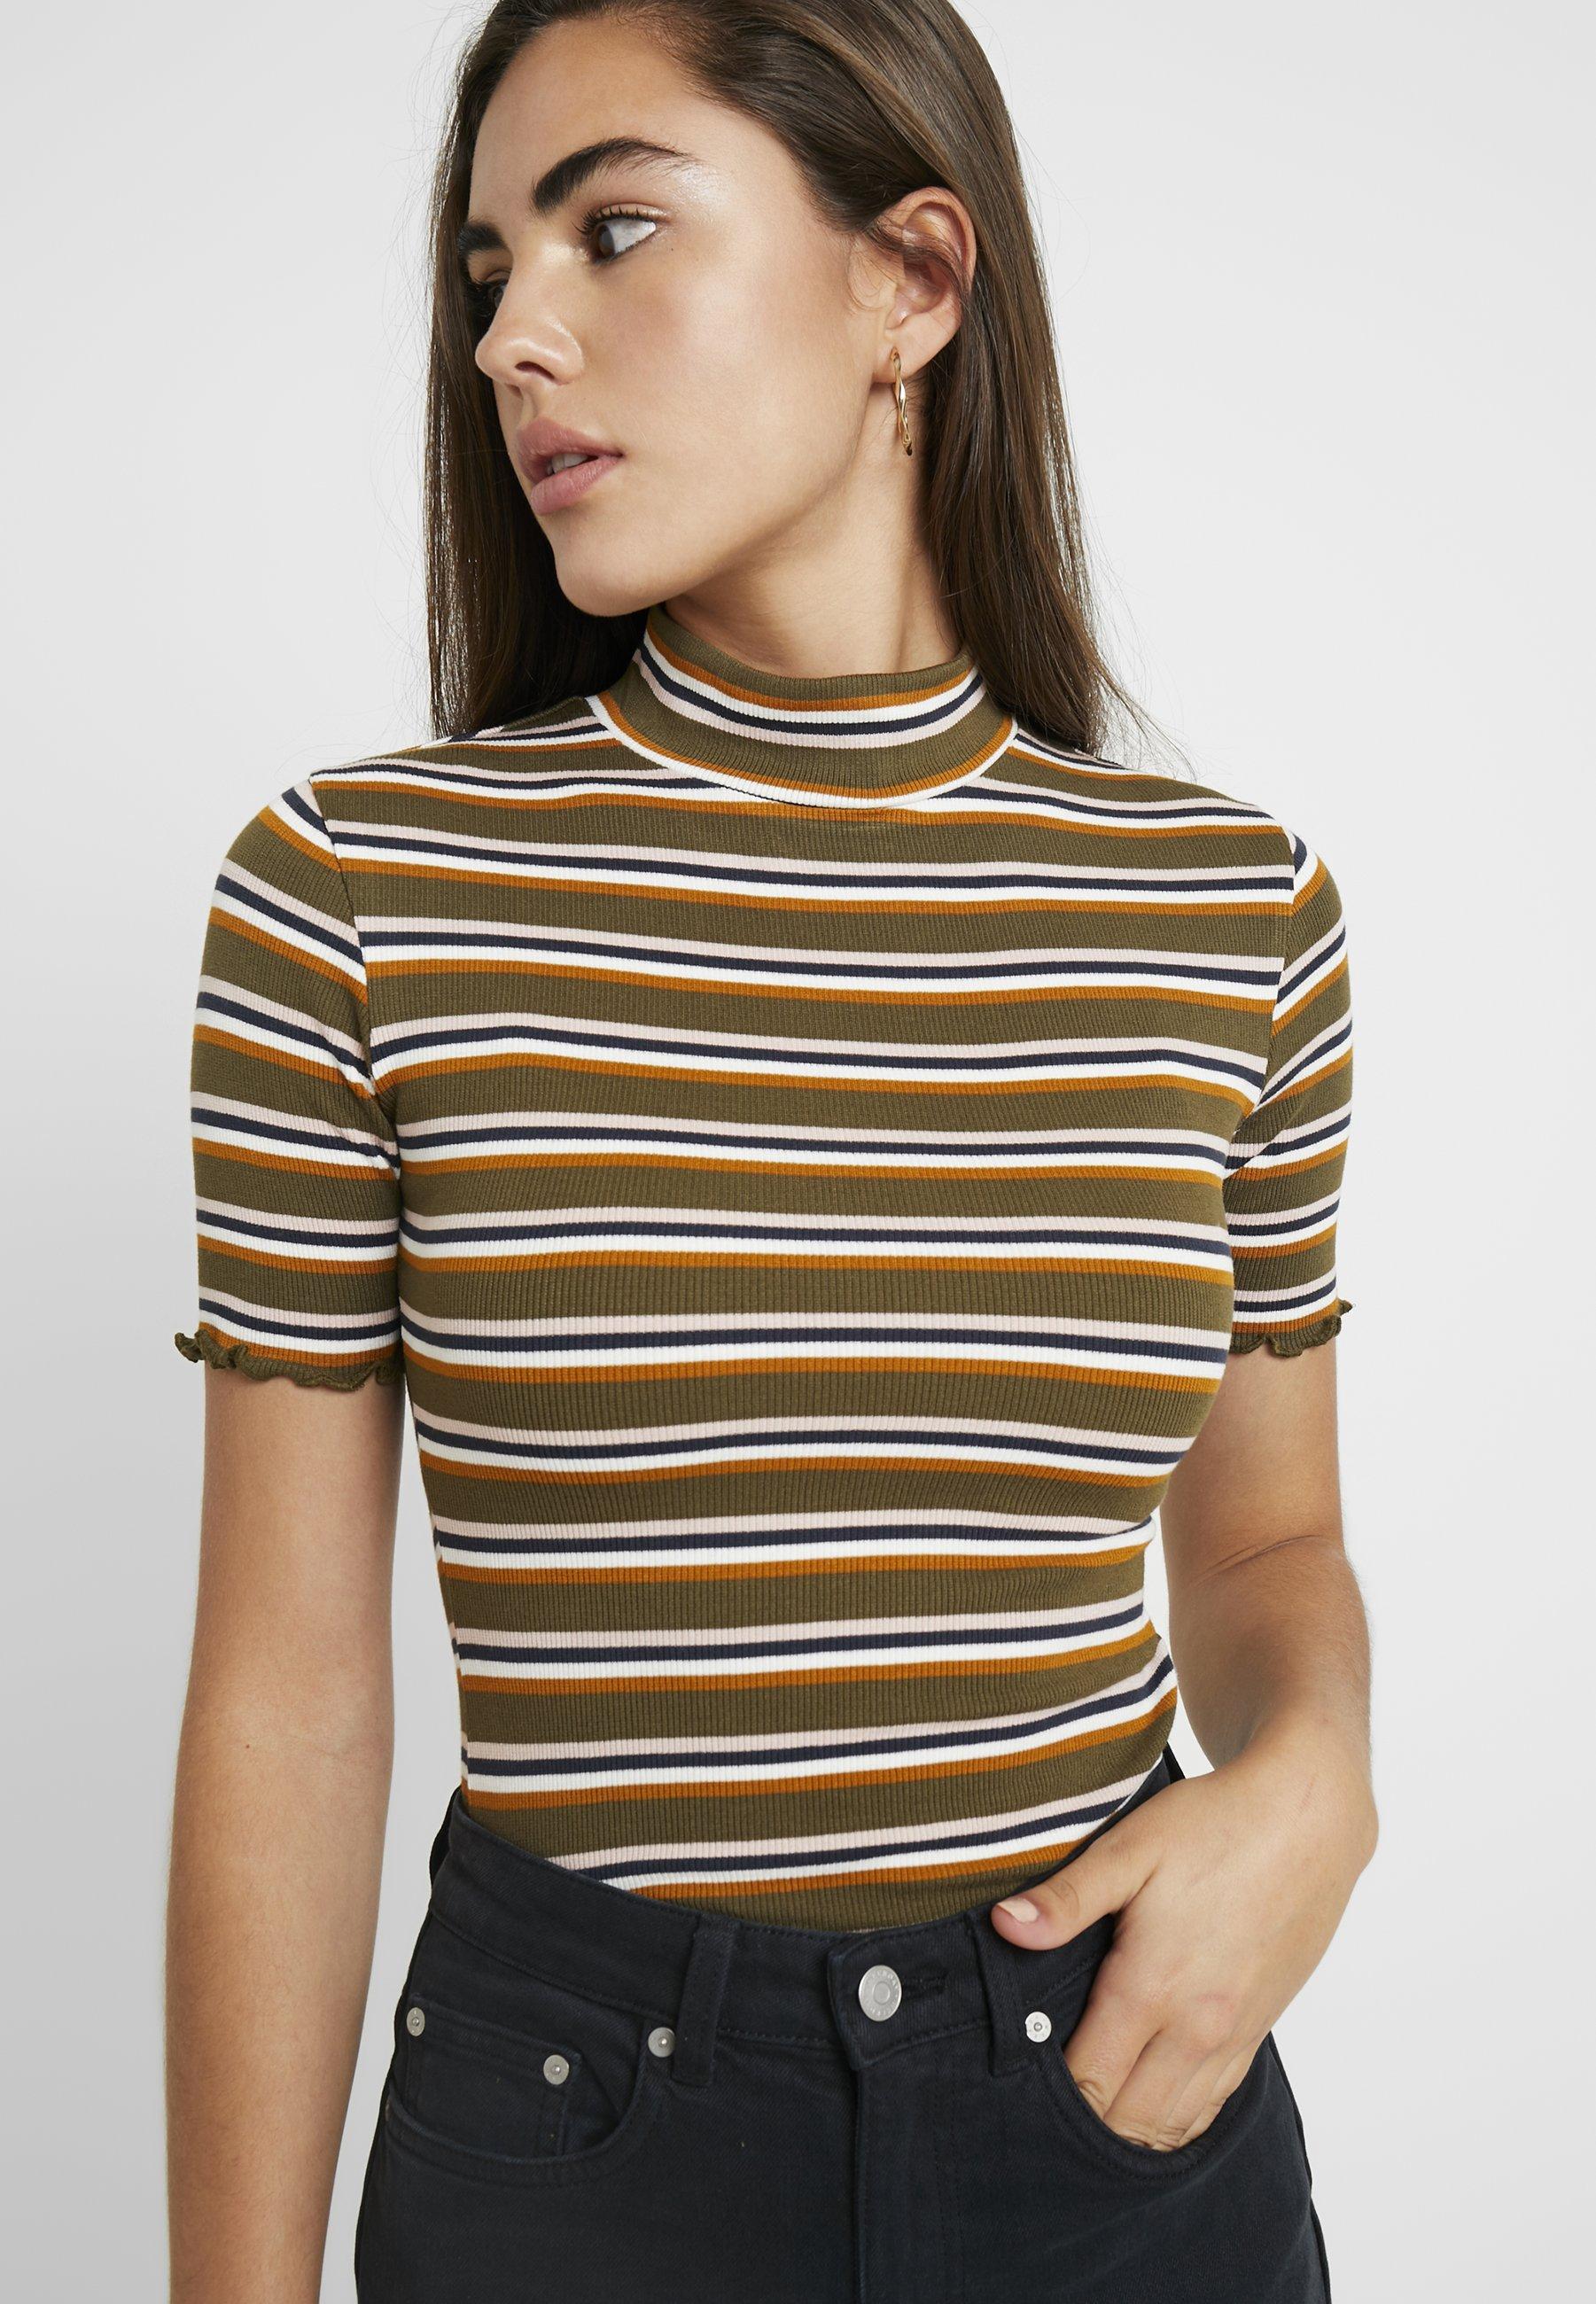 Slated Stampa Con Drab shirt Army TurtleneckT Rvca wNm08n